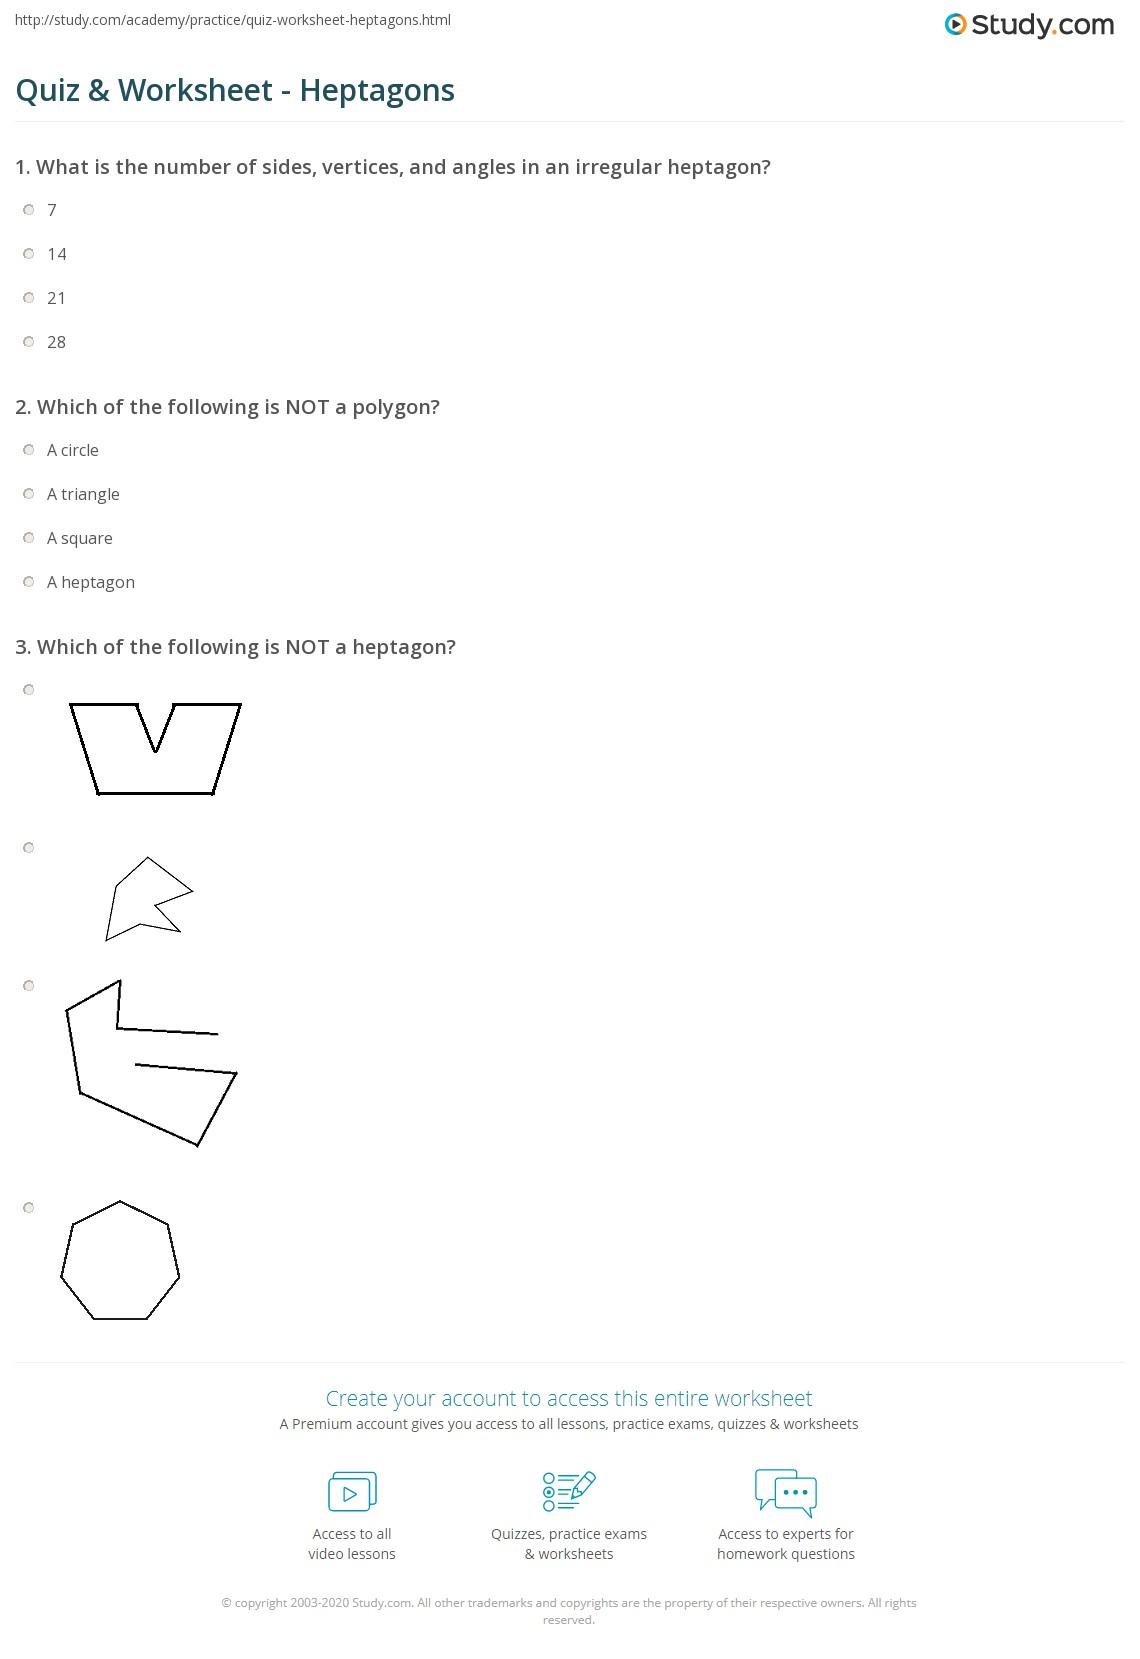 Quiz & Worksheet - Heptagons   Study.com